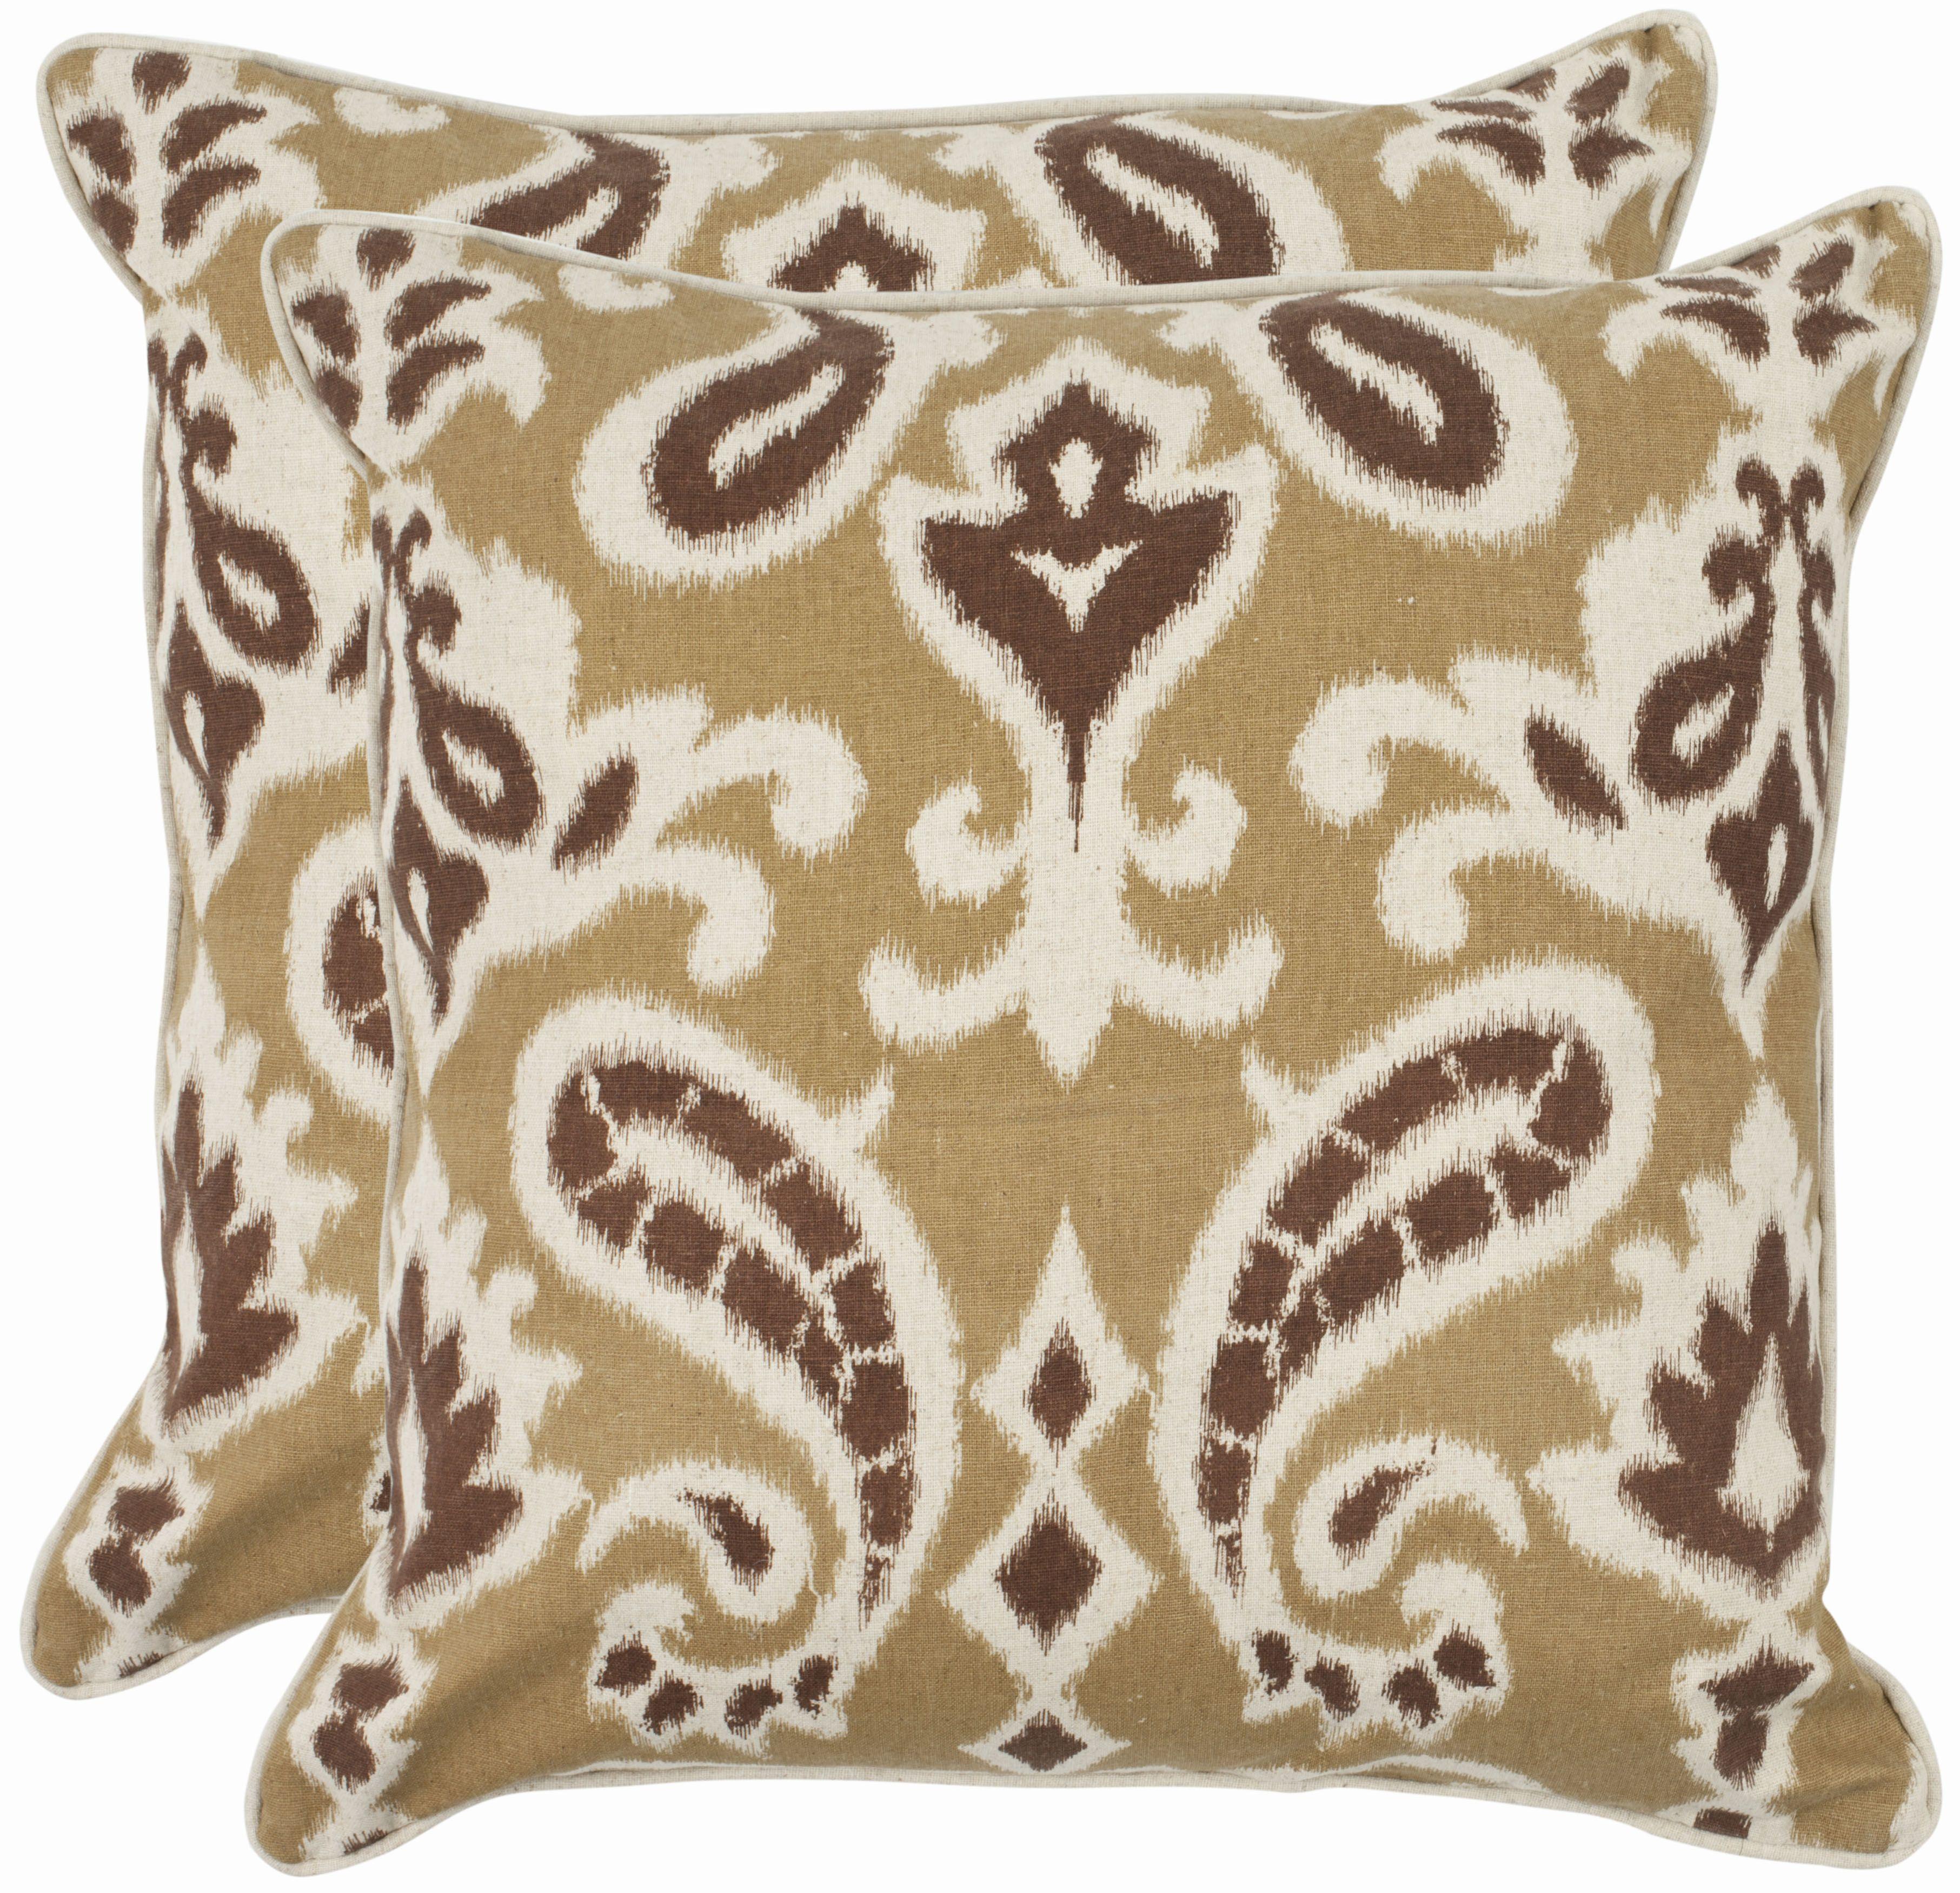 Safavieh Dylan Pillow Beige & Tan Products Pinterest